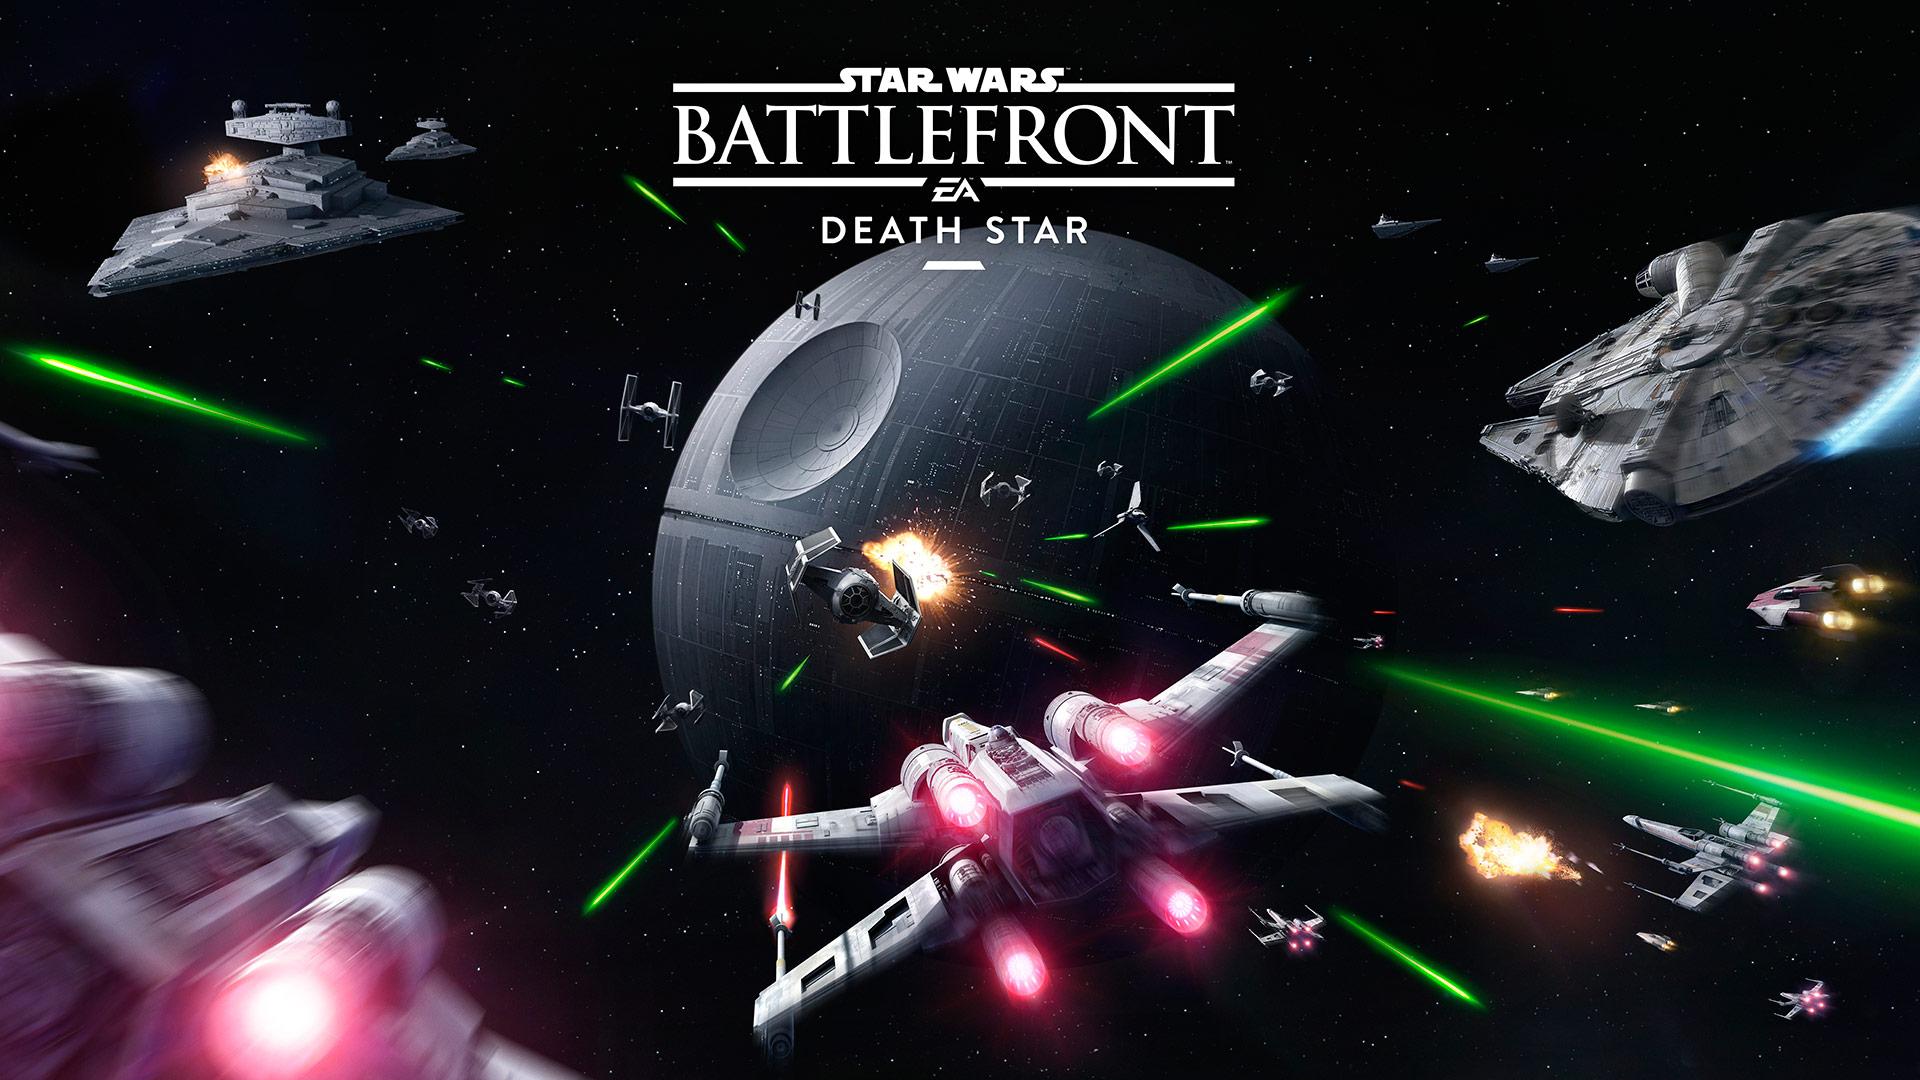 star-wars-battlefront-the-death-star-dlc-pn